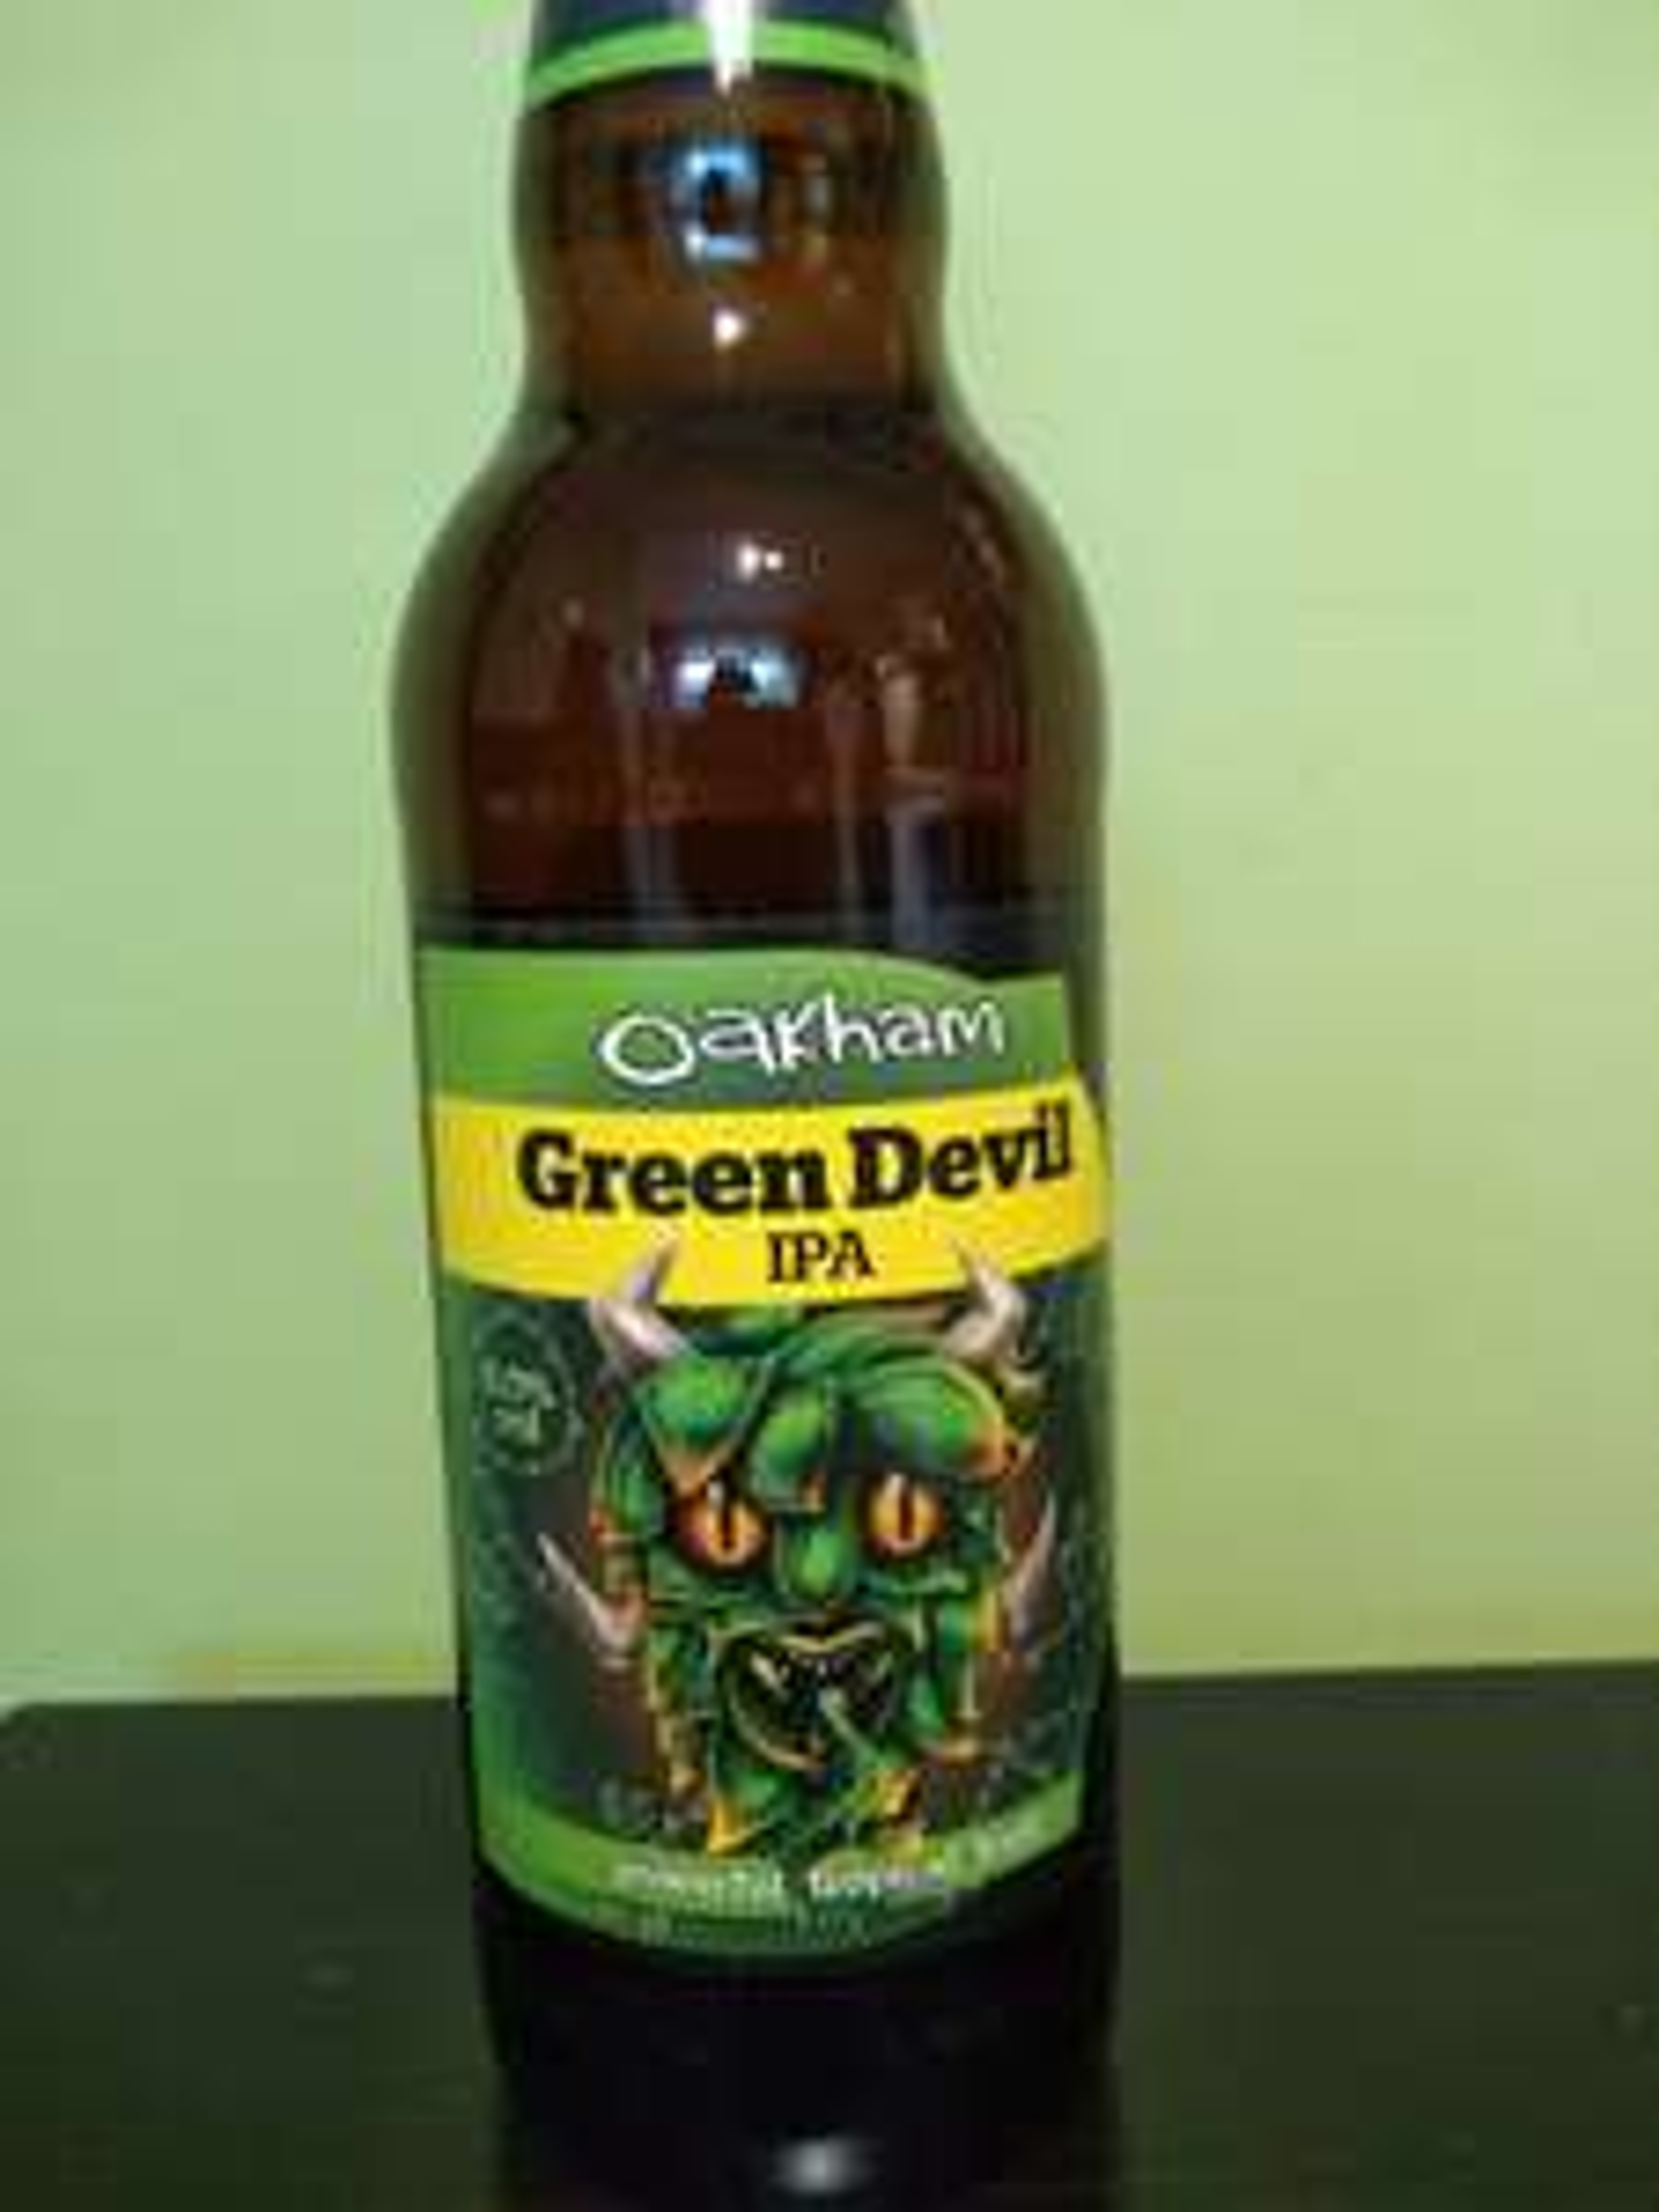 Oakham Ales Green Devil IPA 500ml £1.19 - Home Bargains